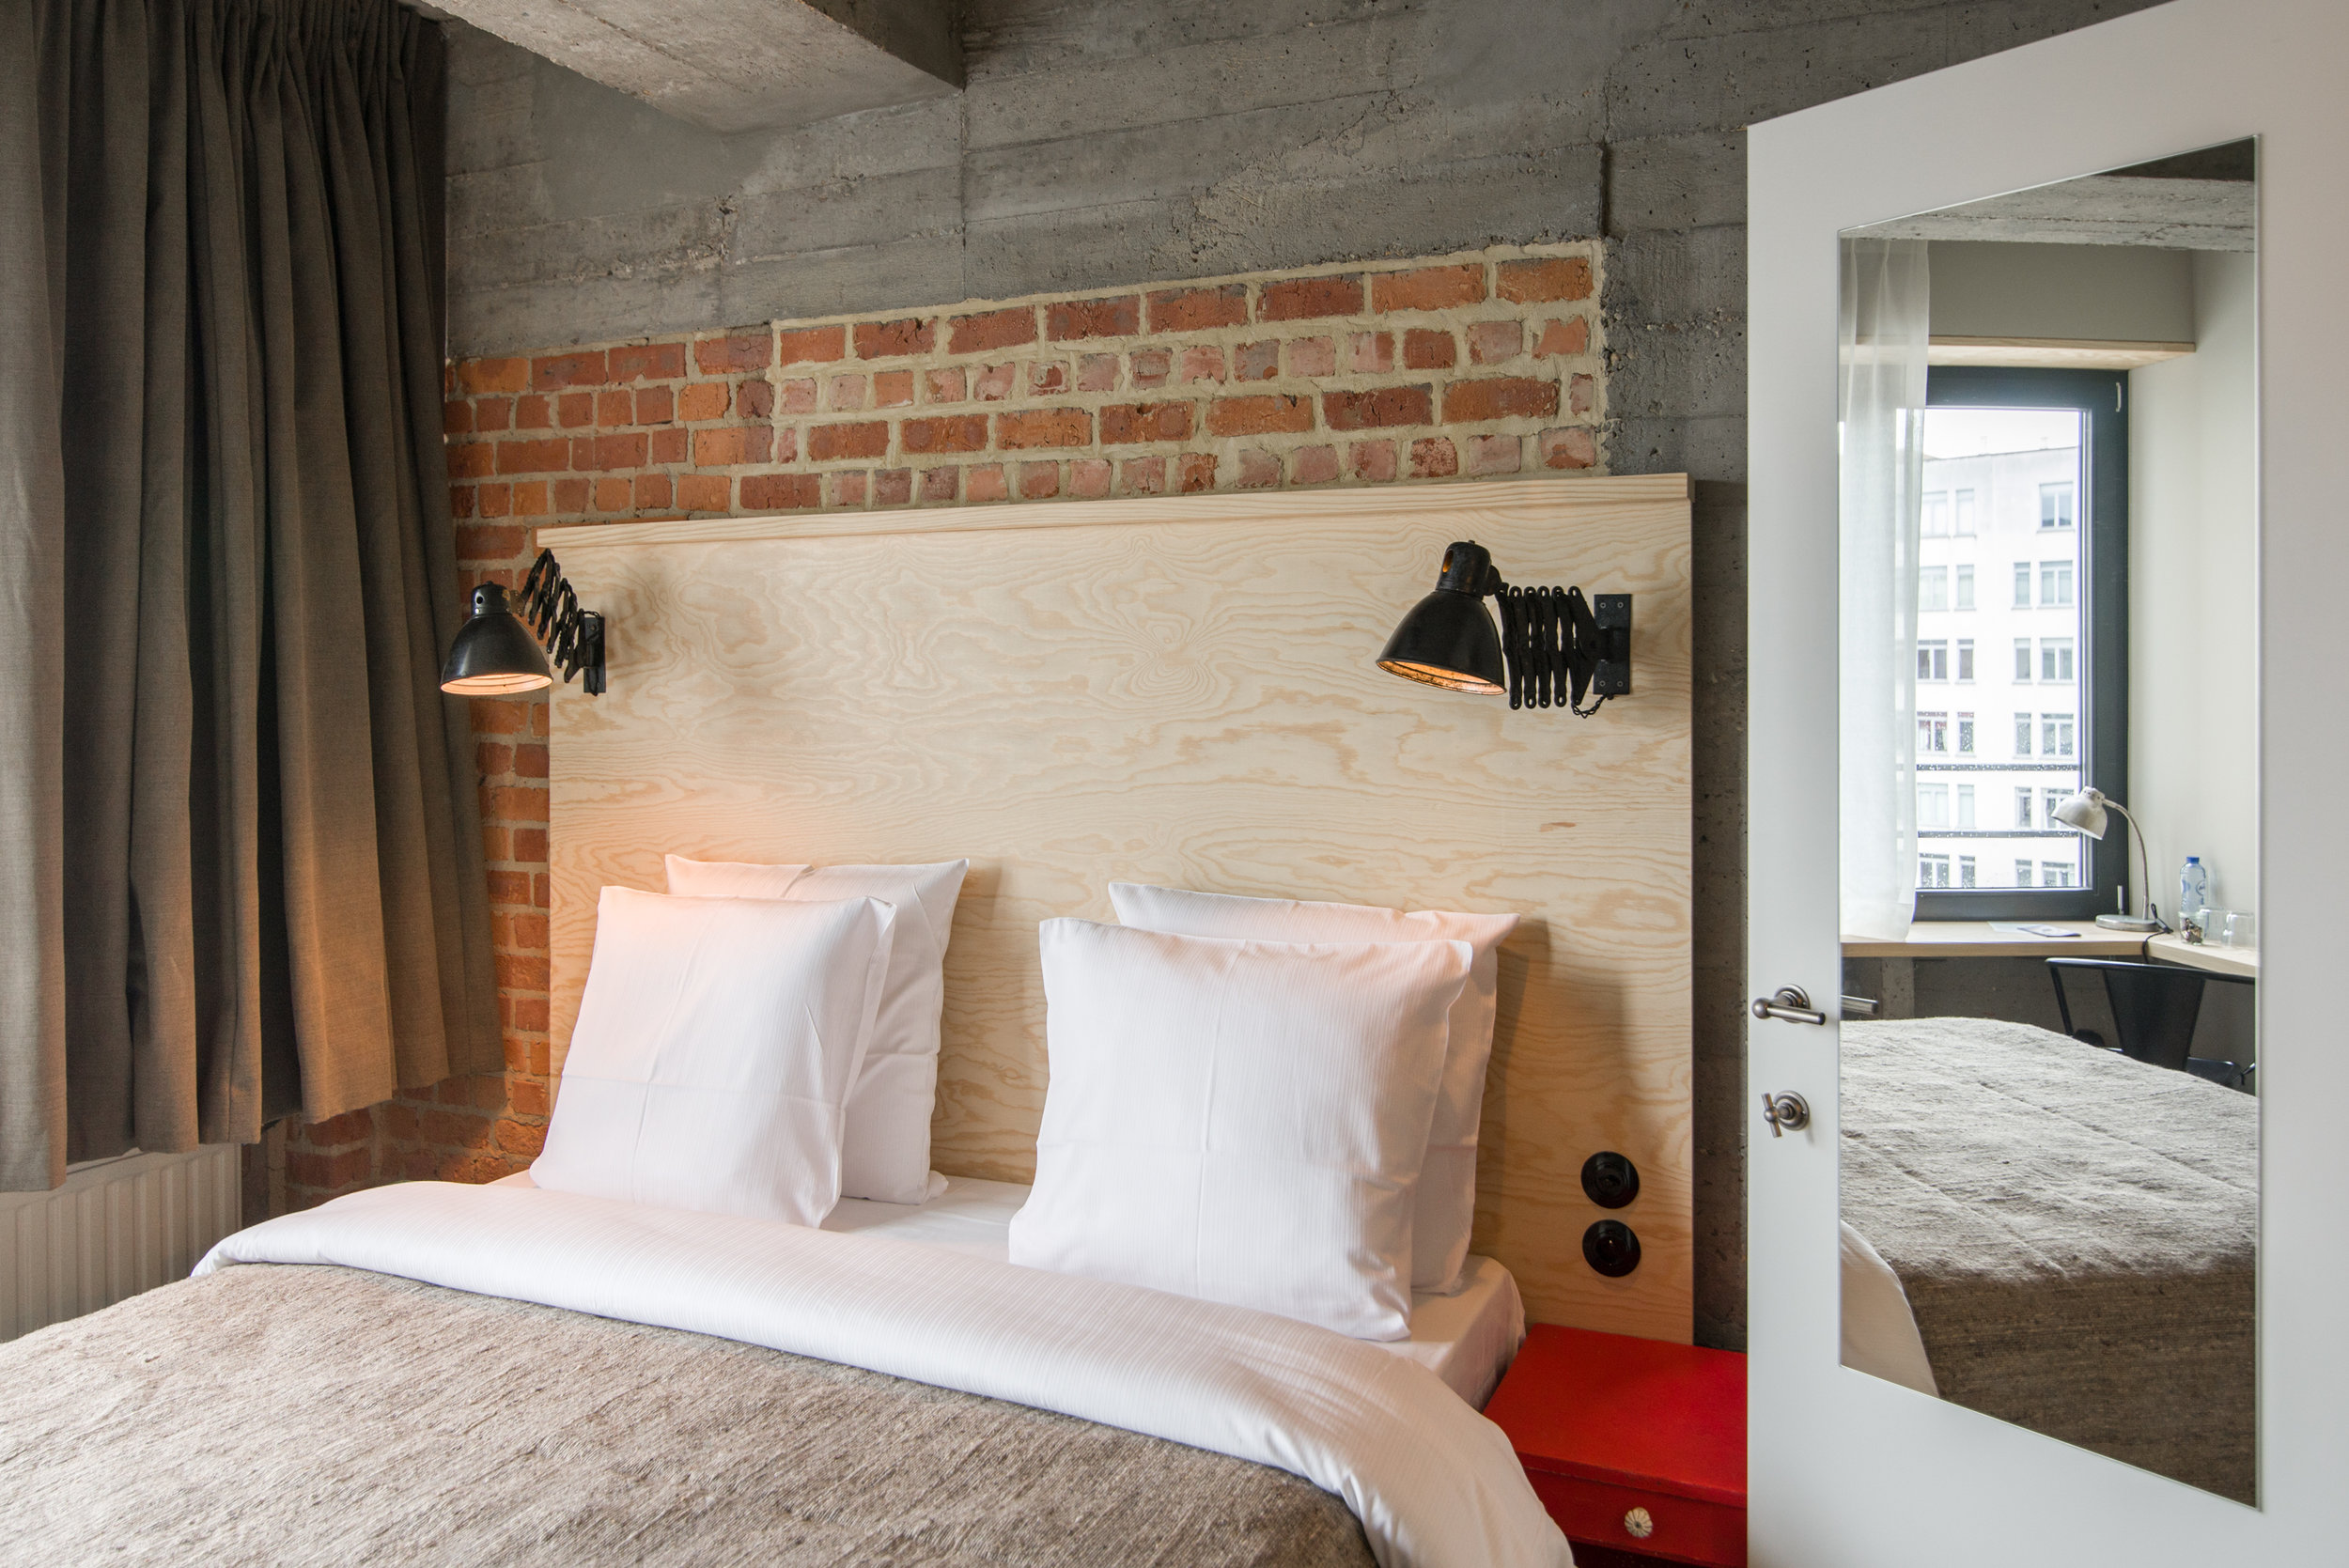 jam-hotel-brussels-rooms-extra-room-03.jpg